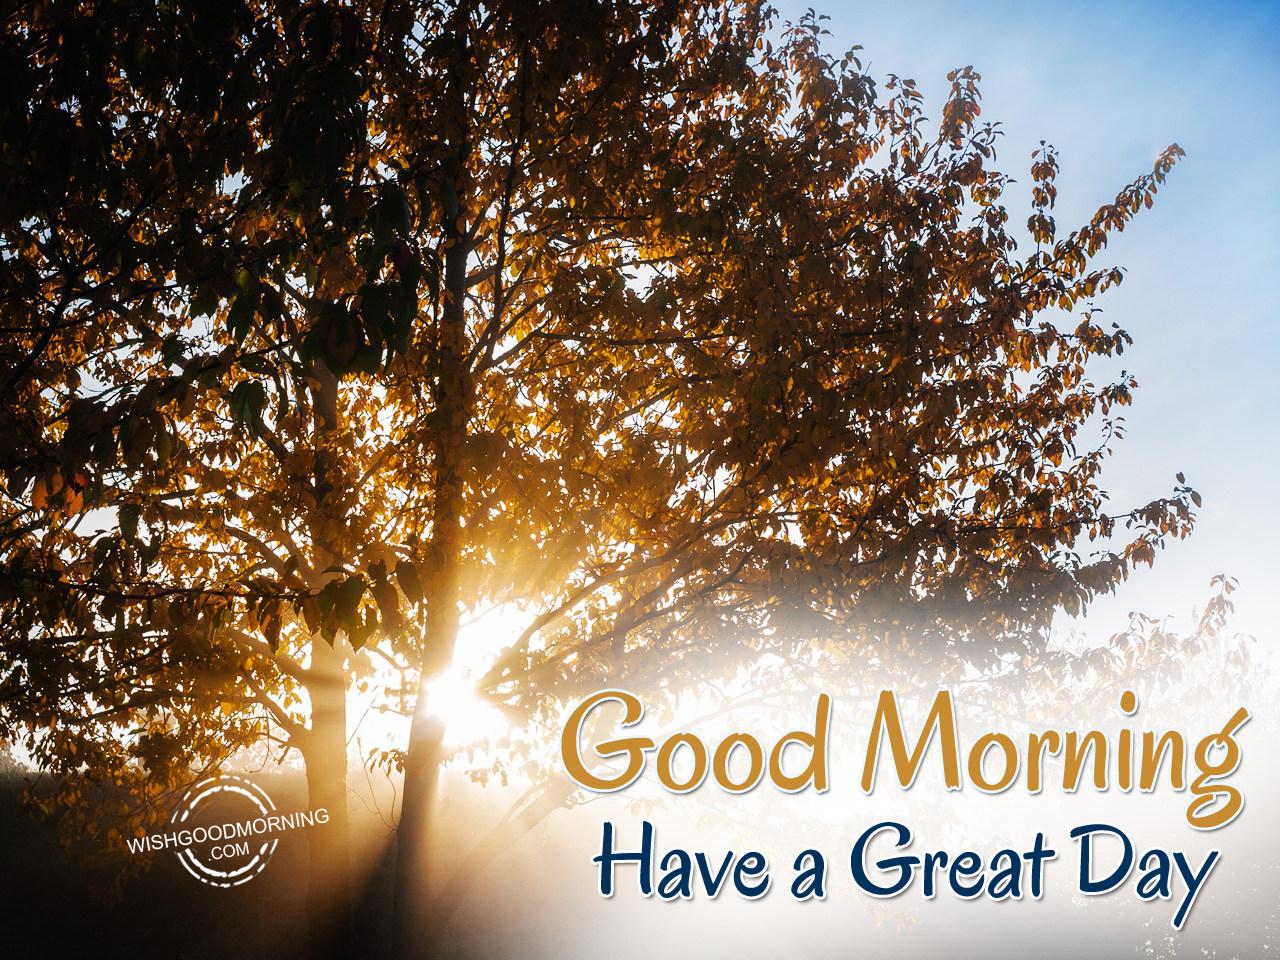 Manpreet Singh Good Morning Pictures Wishgoodmorningcom